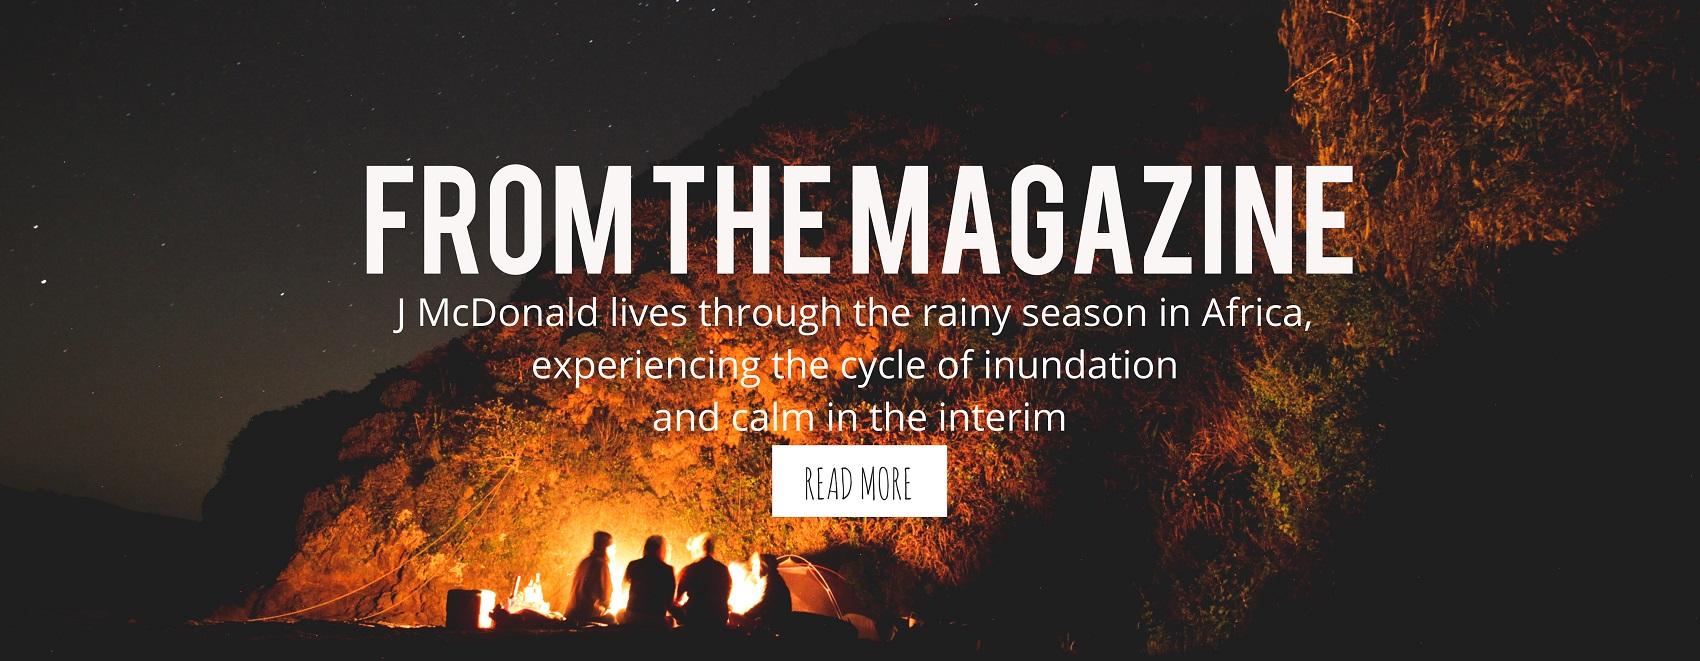 fromthemagazine-readmore2